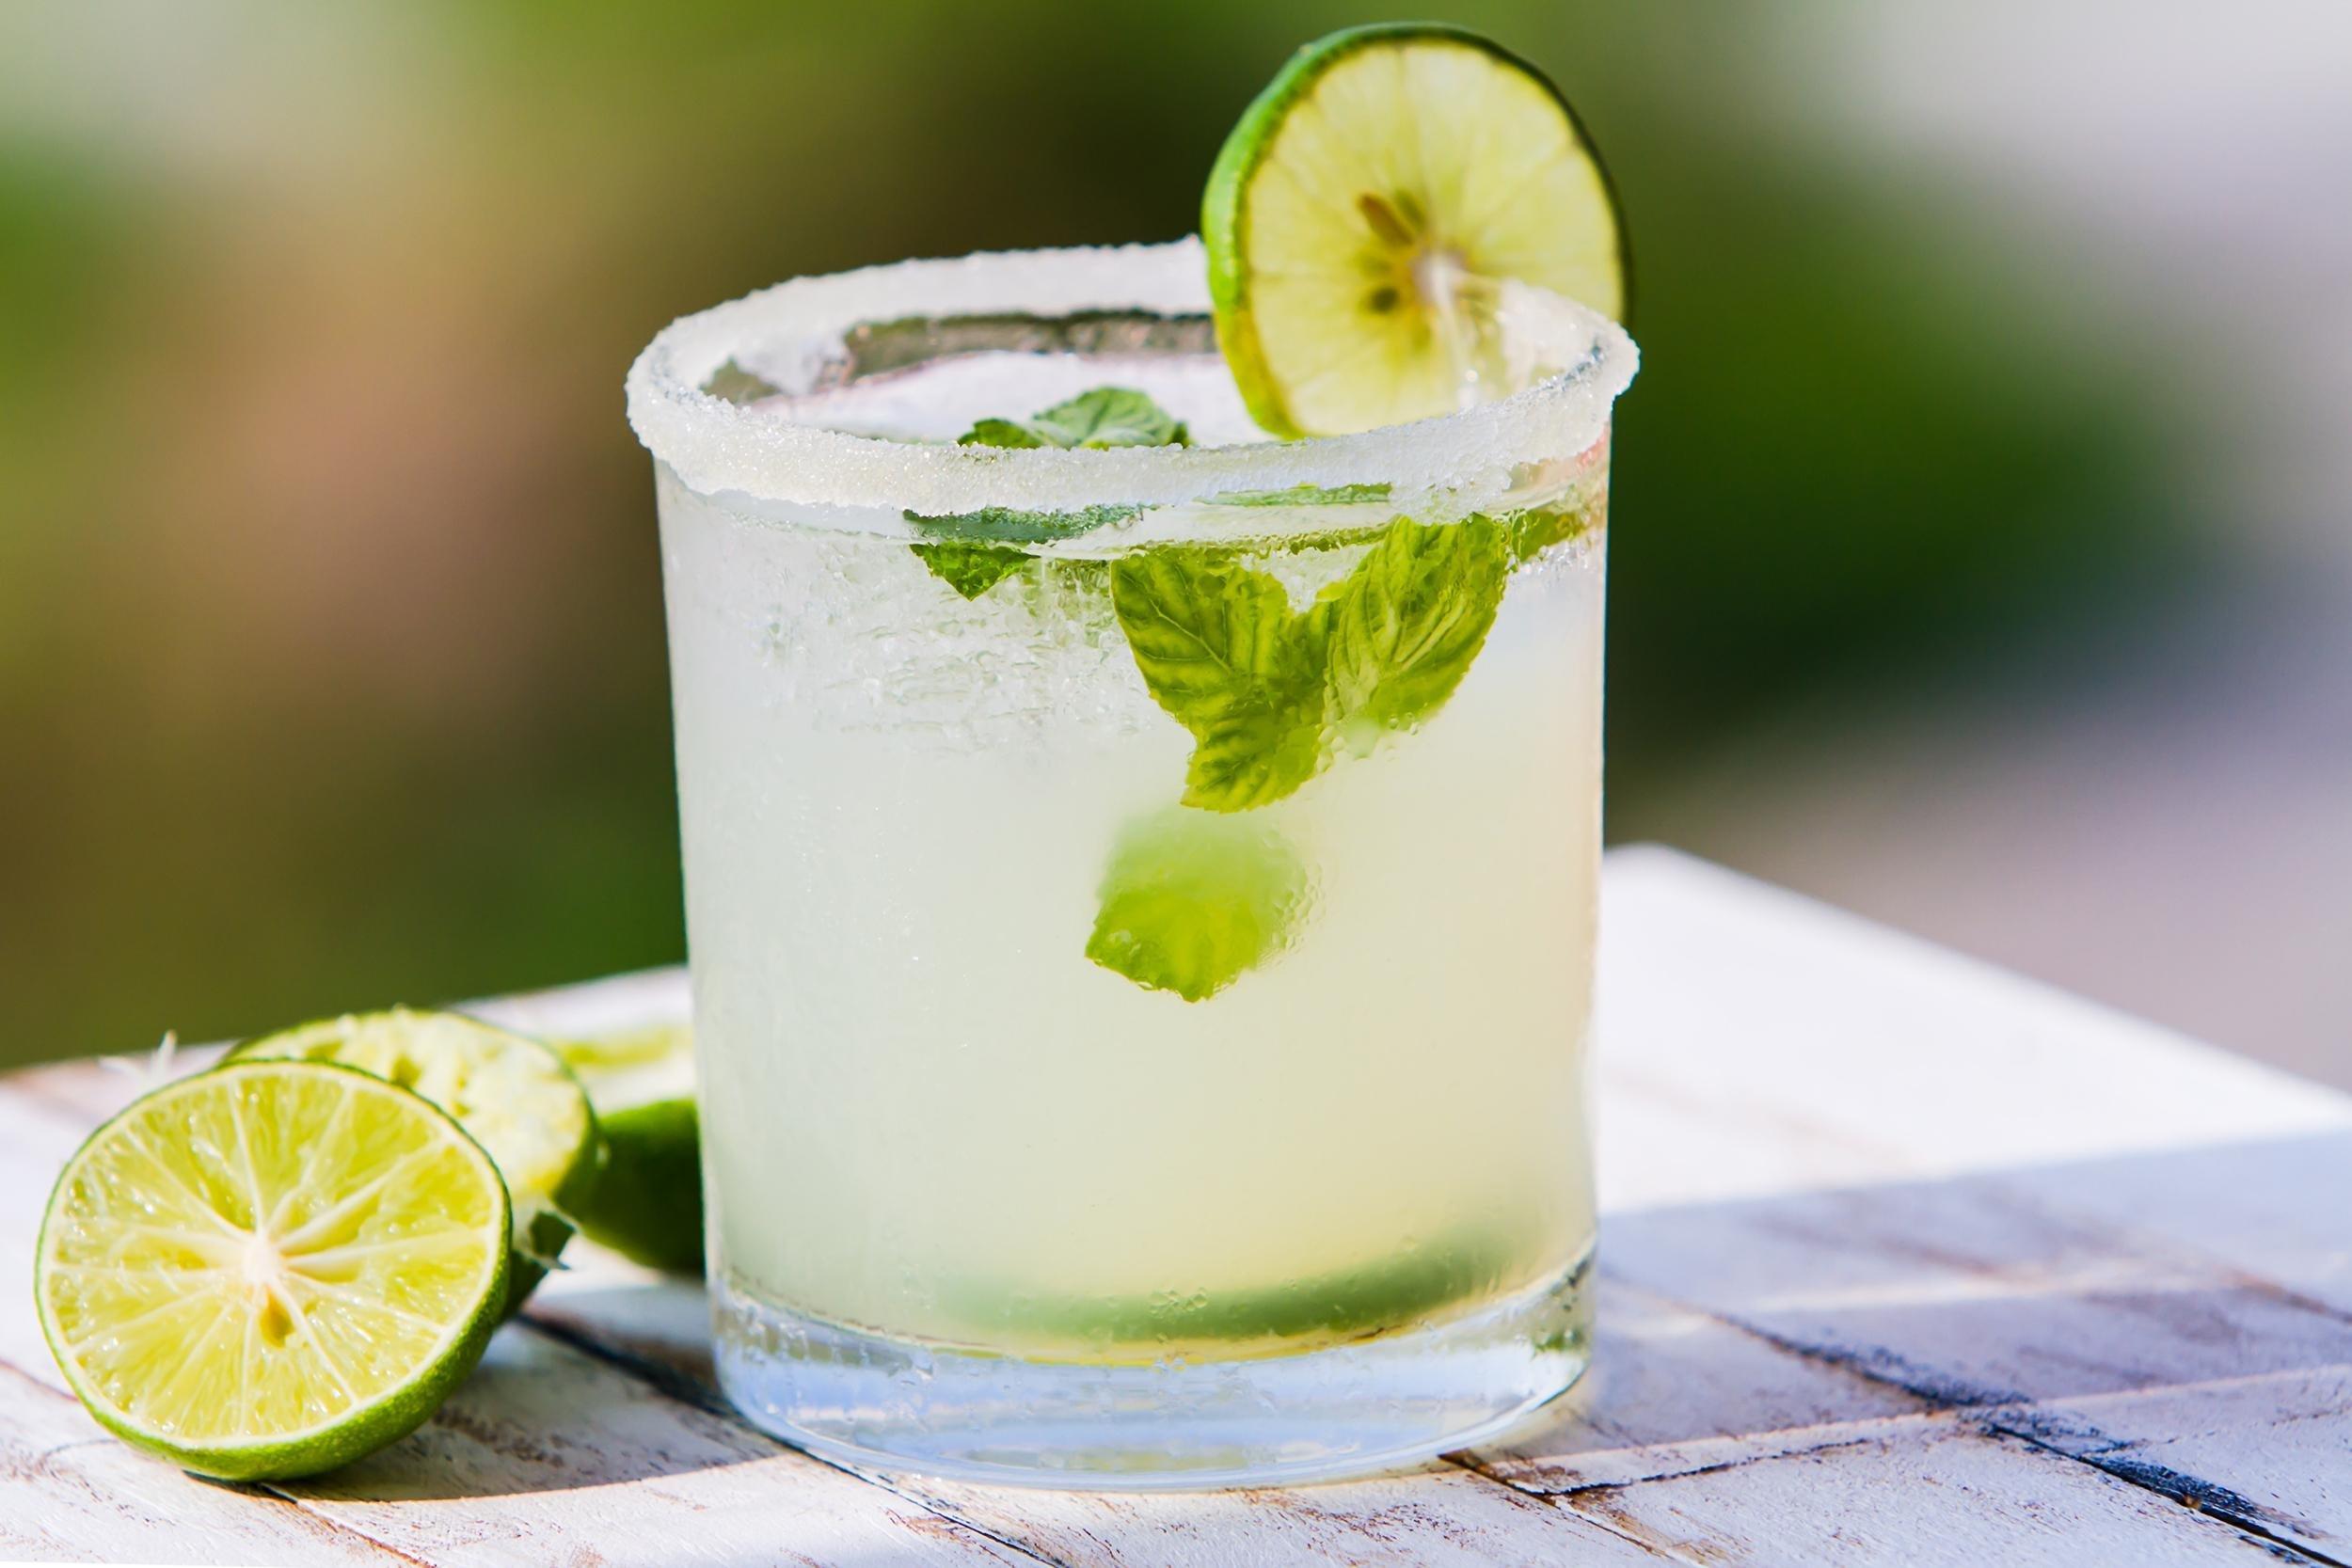 102-20160429-043422-4290-042616_best_tequila_dr.original.jpg